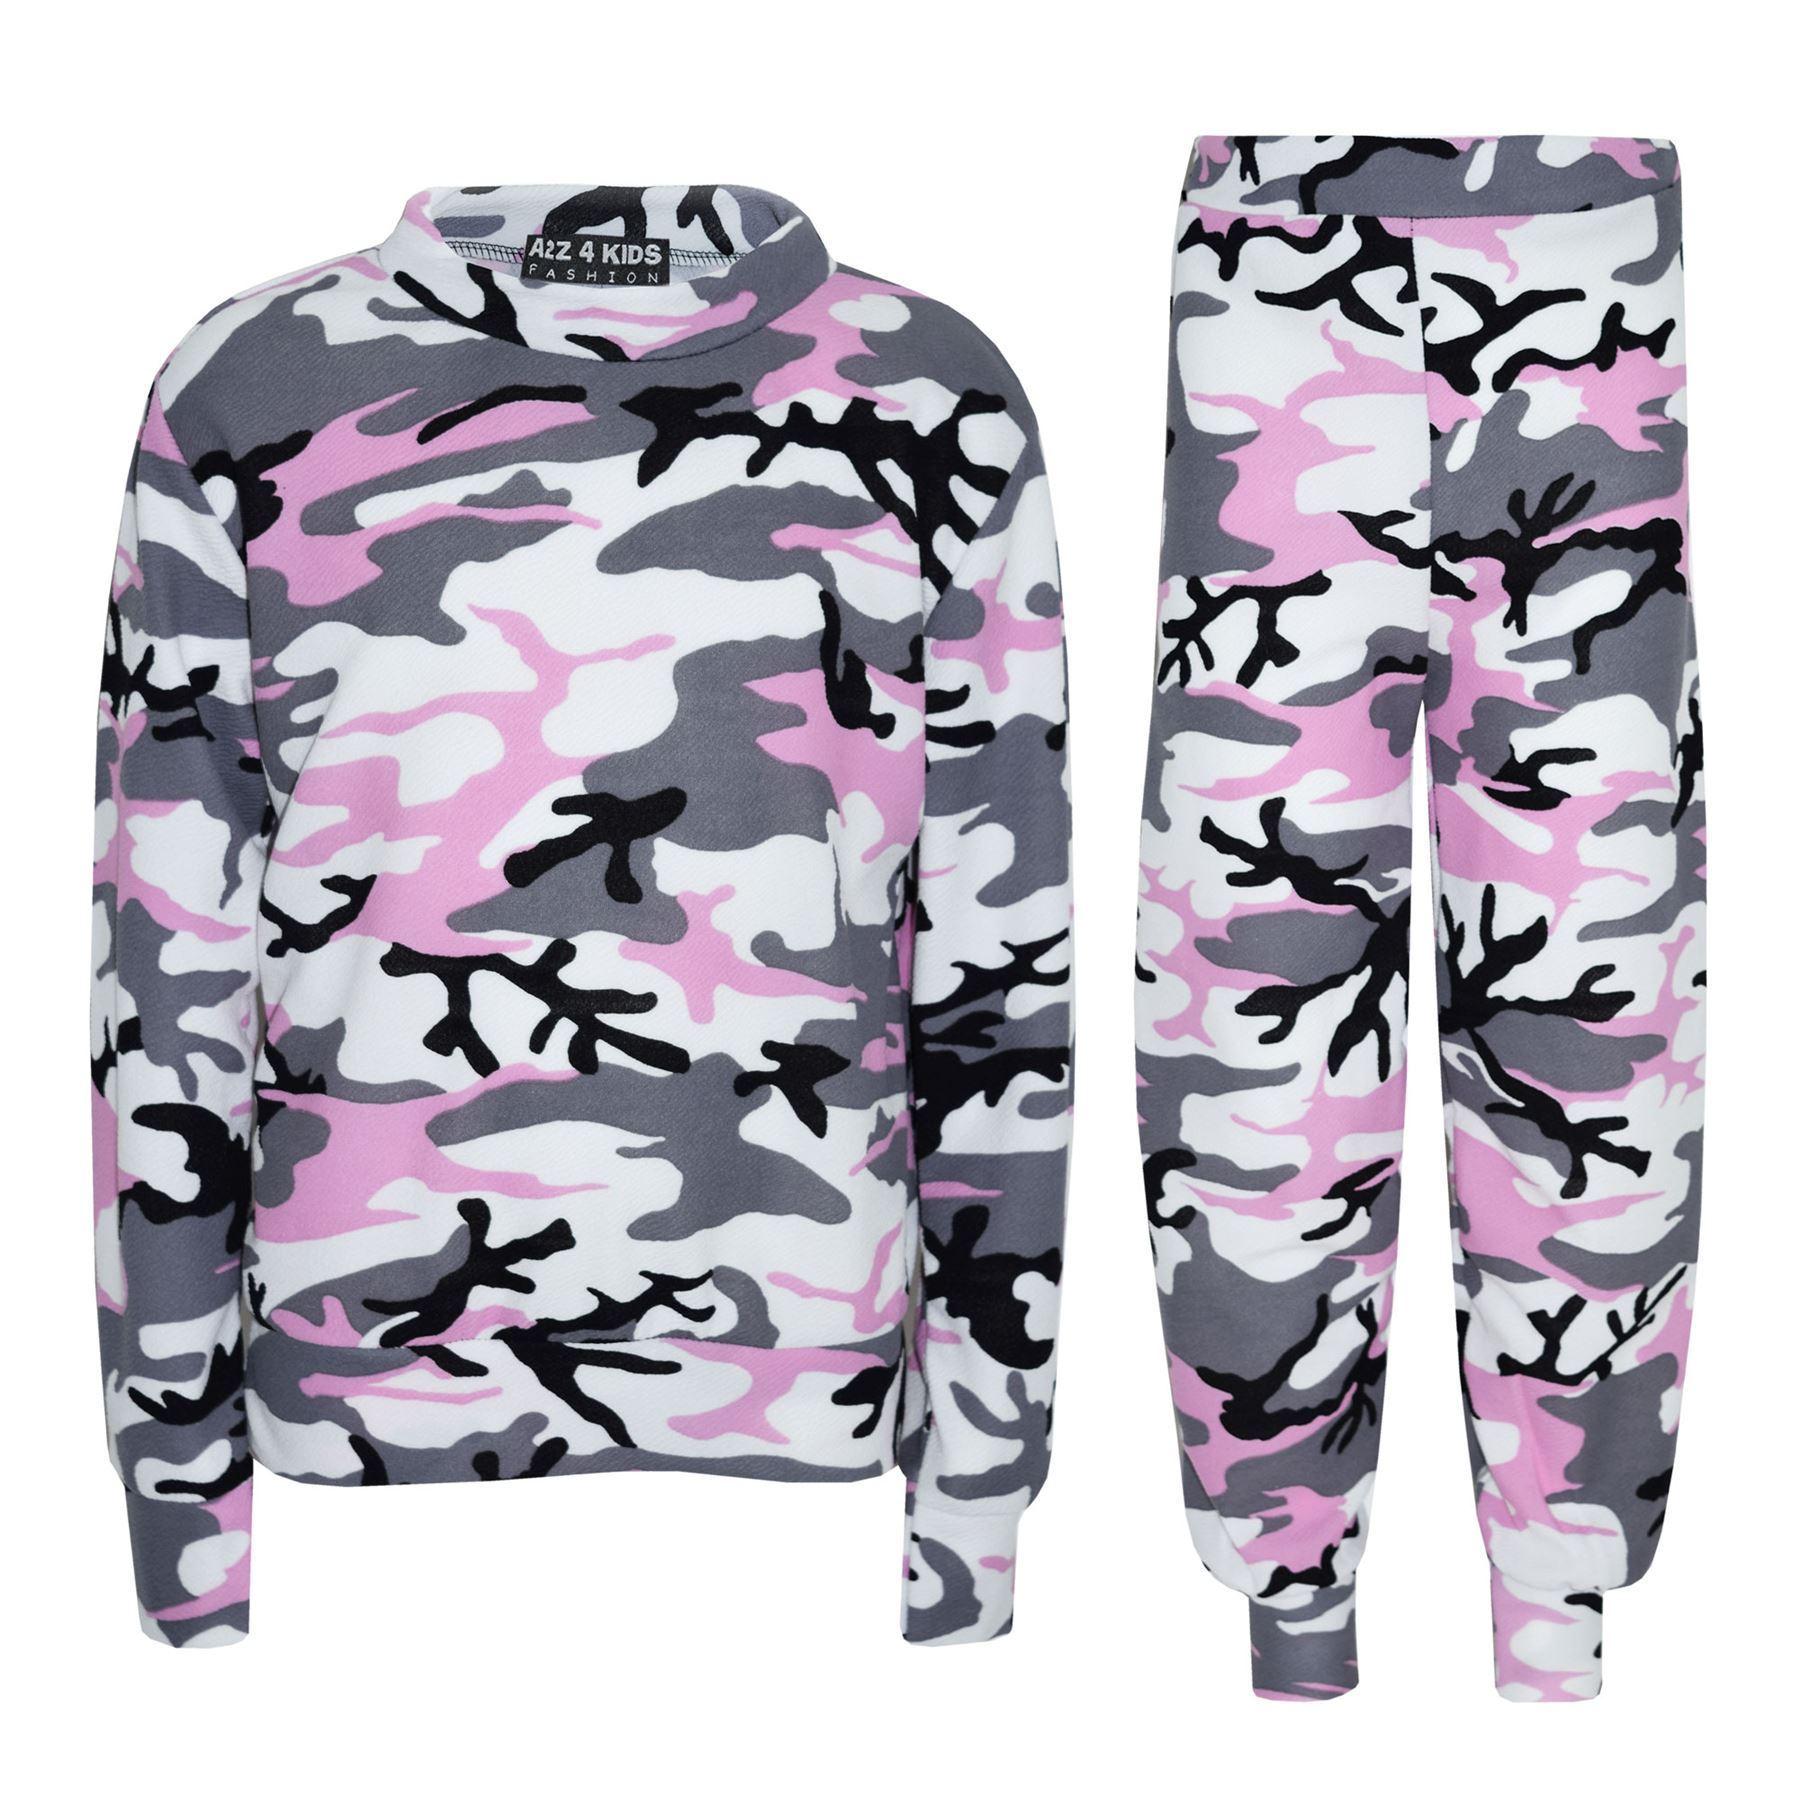 Enfants-filles-CamouFlage-impression-Crop-Top-Legging-veste-survetement-Age-7-13-ans